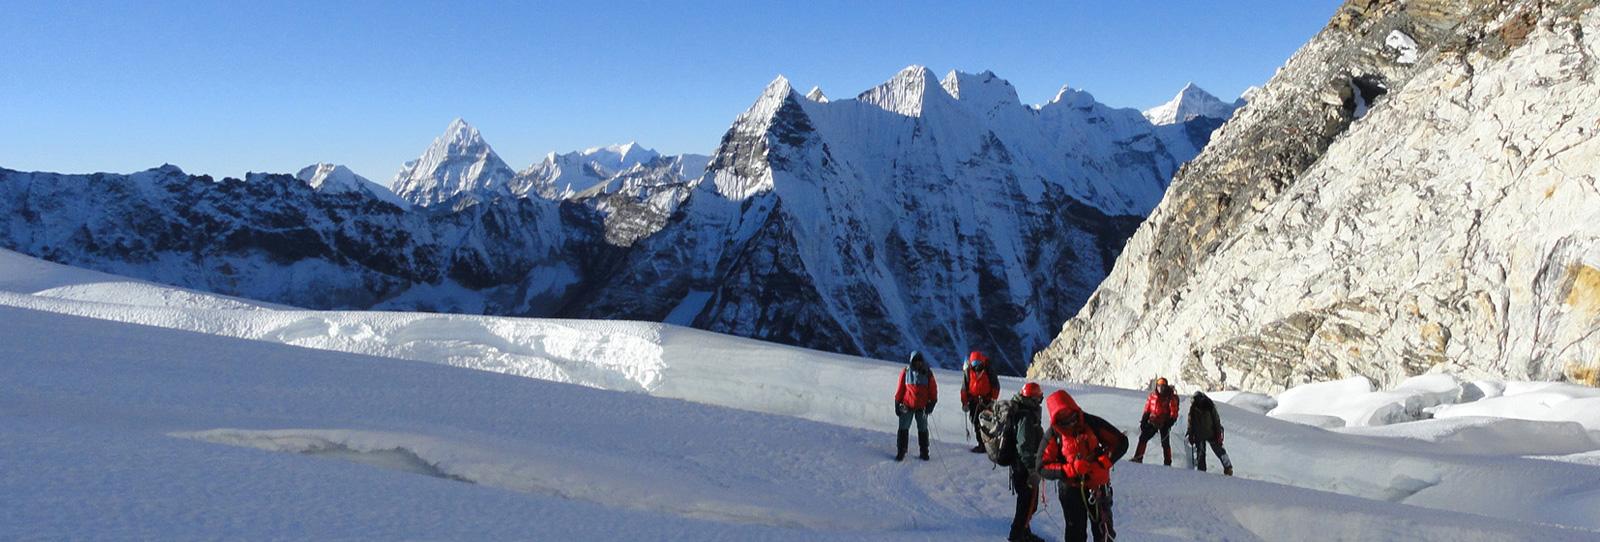 Island Peak Climbing (6189m/20305ft)